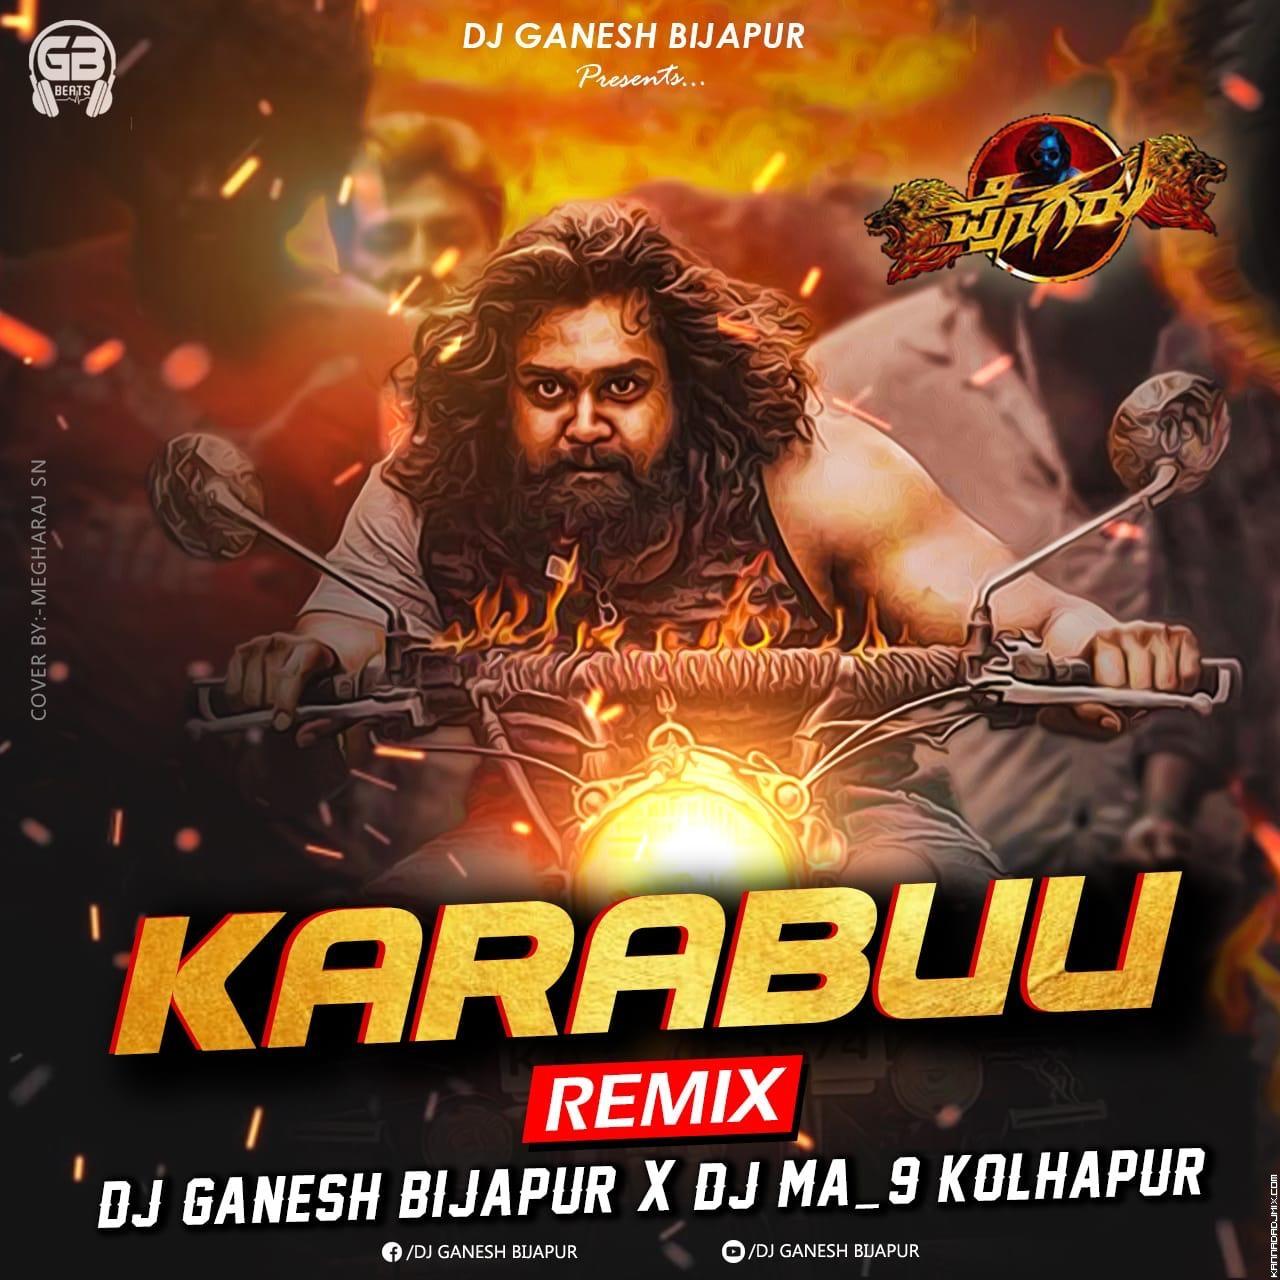 Karabu [Pogaru] Remix Dj Ganesh Bijapur X Dj Ma_9 Kolhapur.mp3